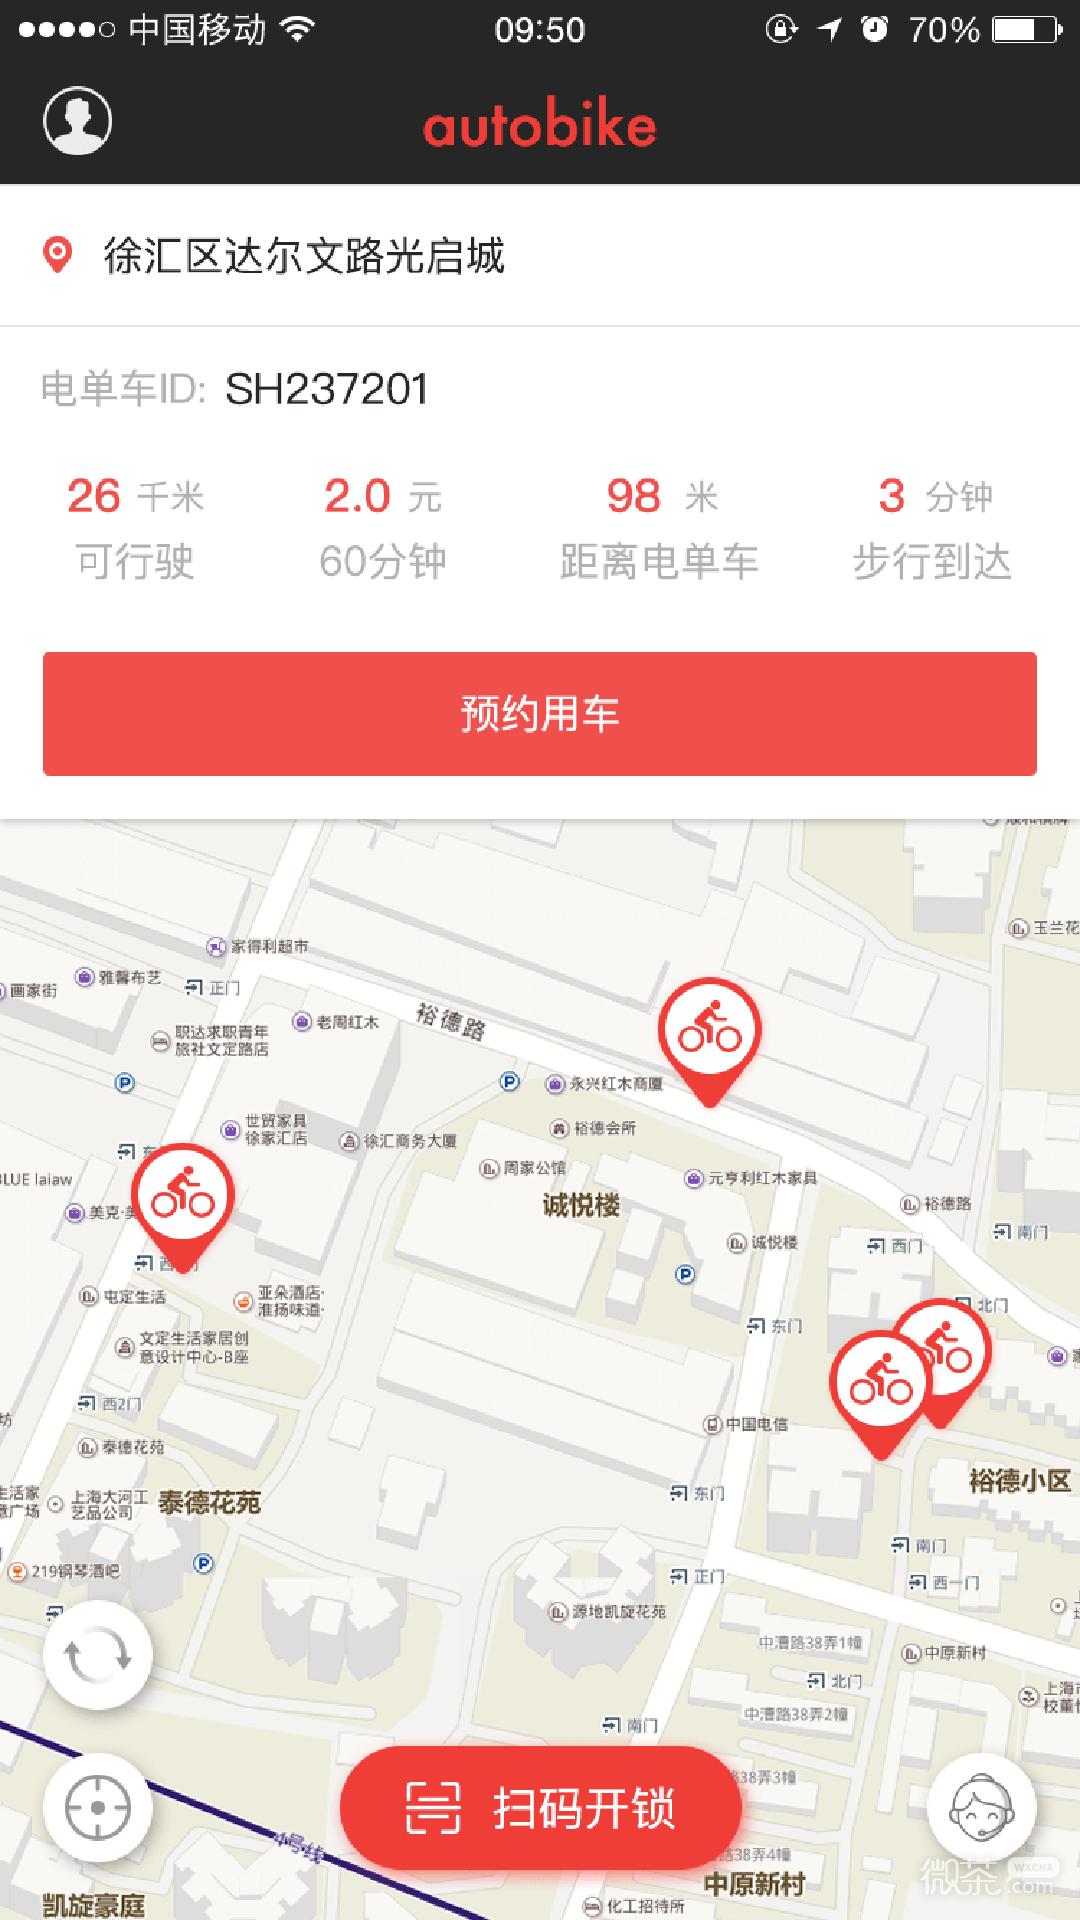 http://img.wxcha.com/小鱼出行(租车软件)